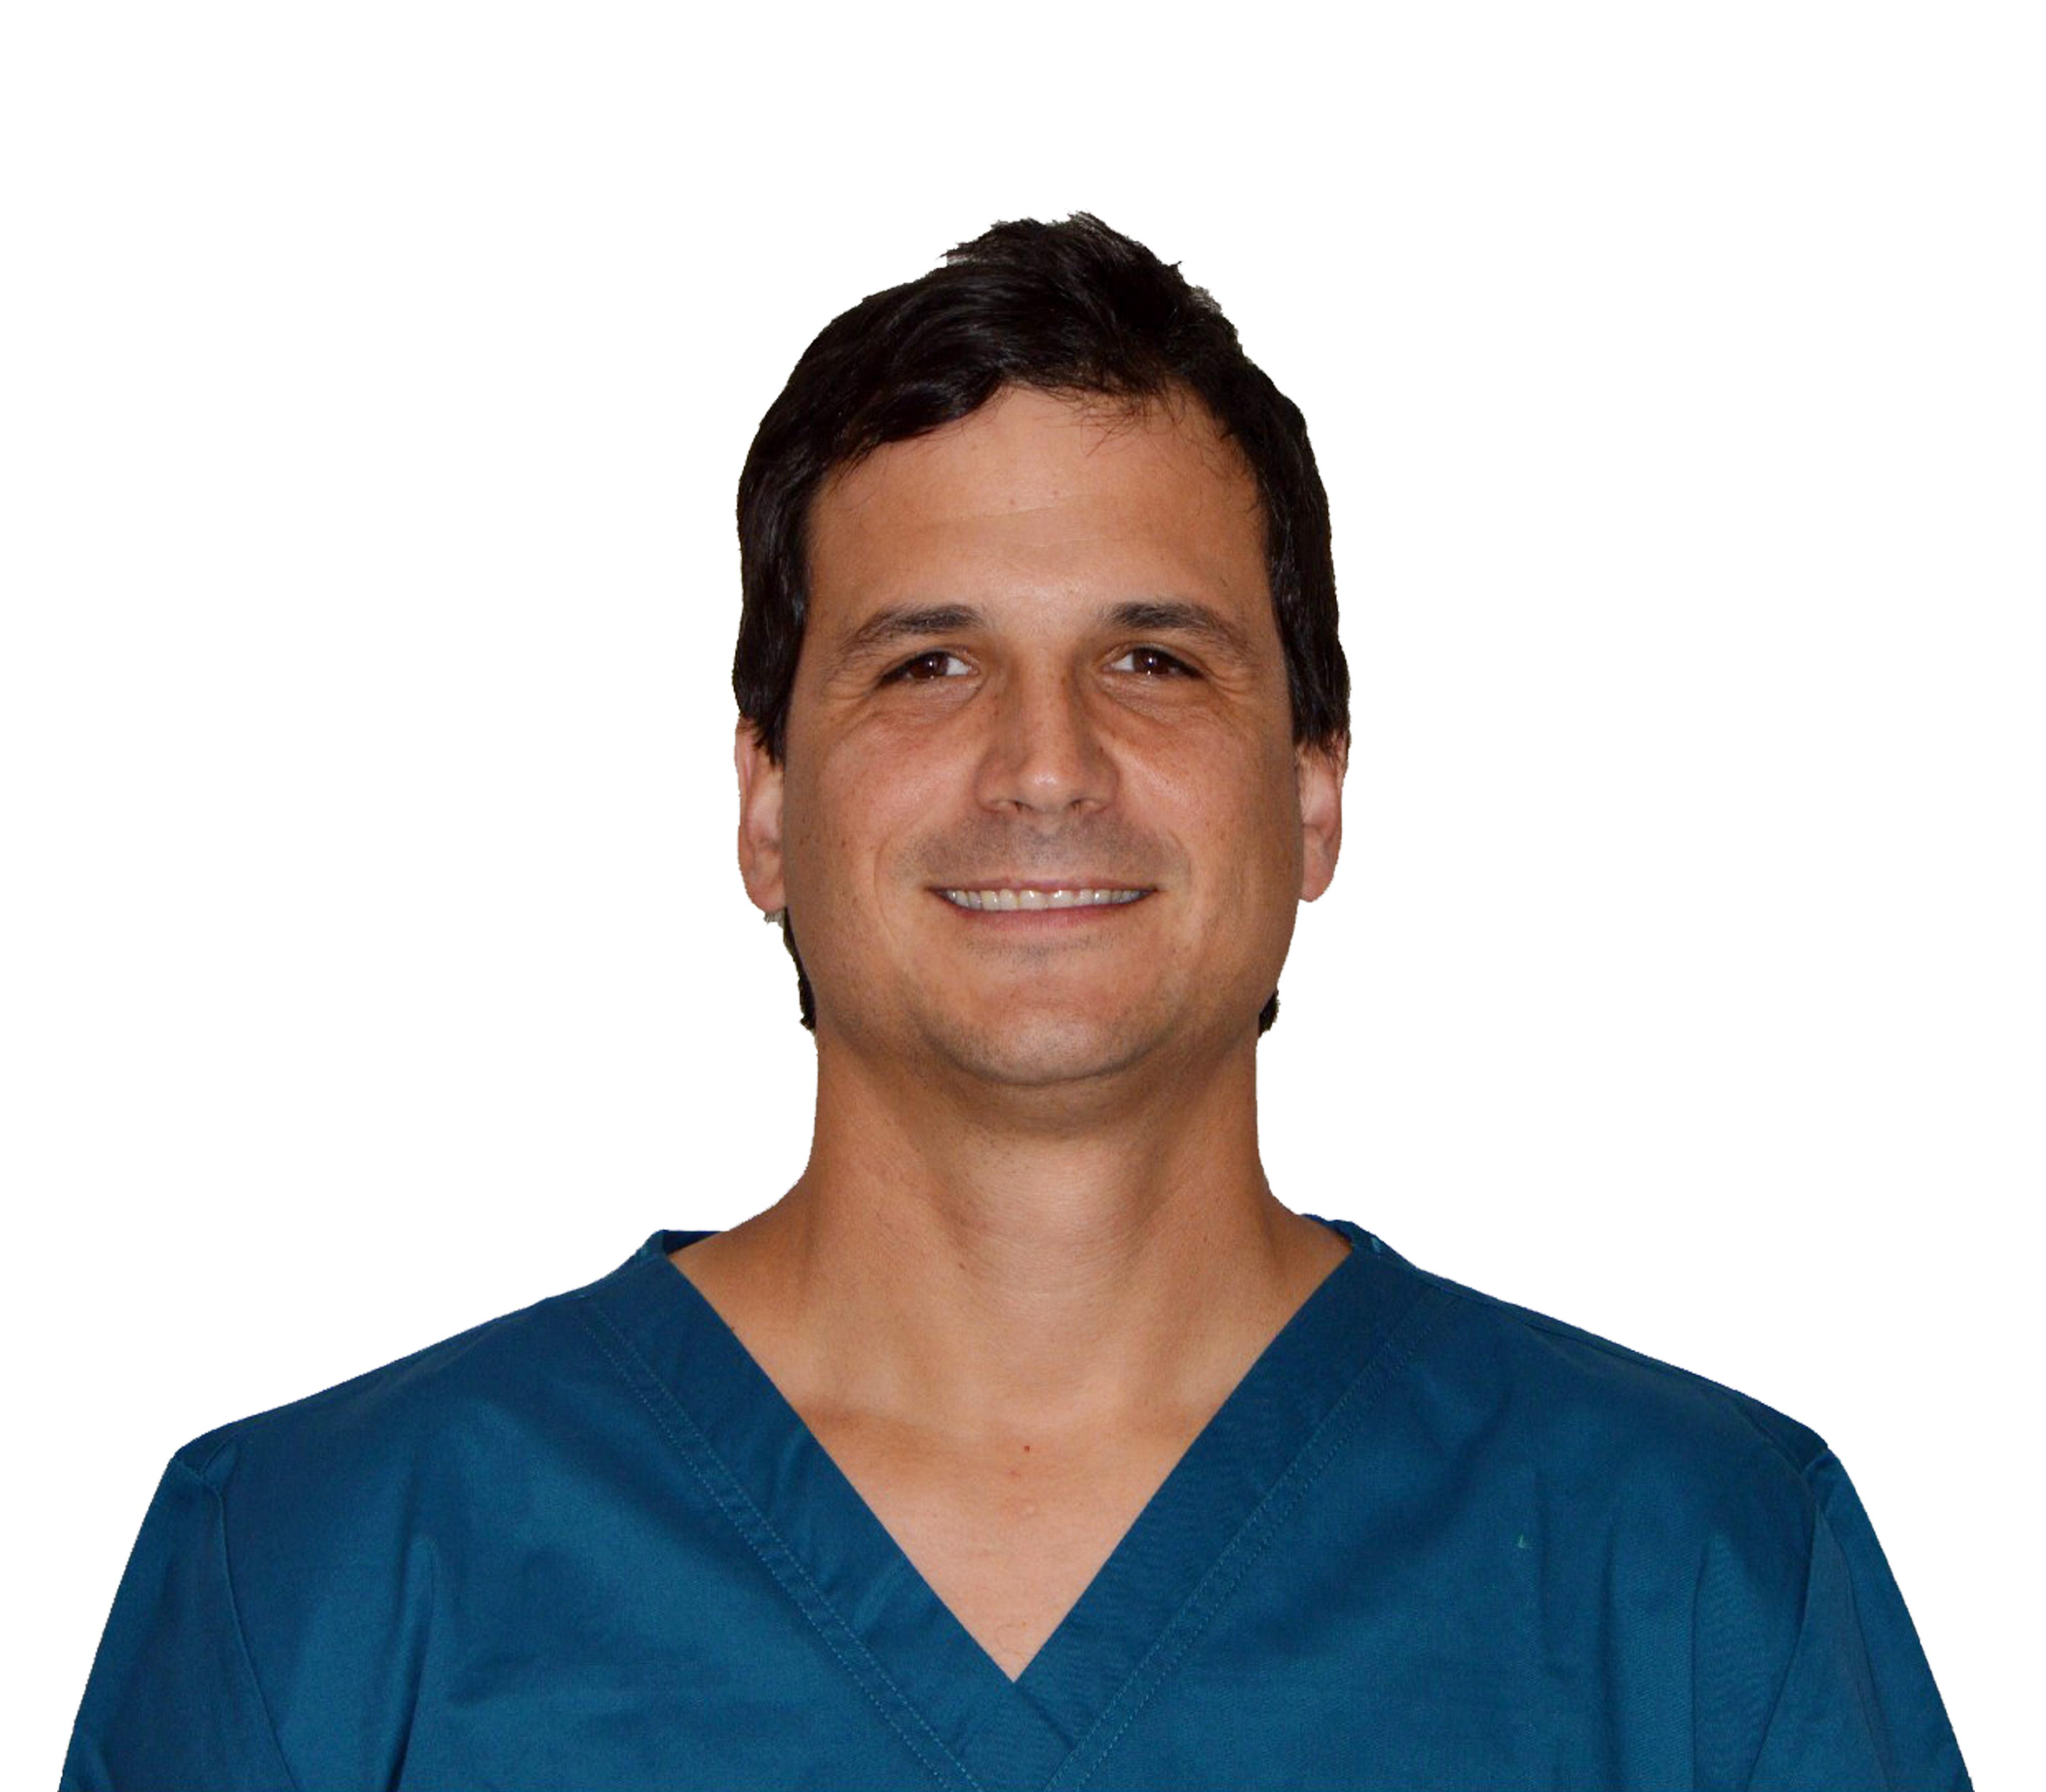 Dr. Cristobal Ramsay